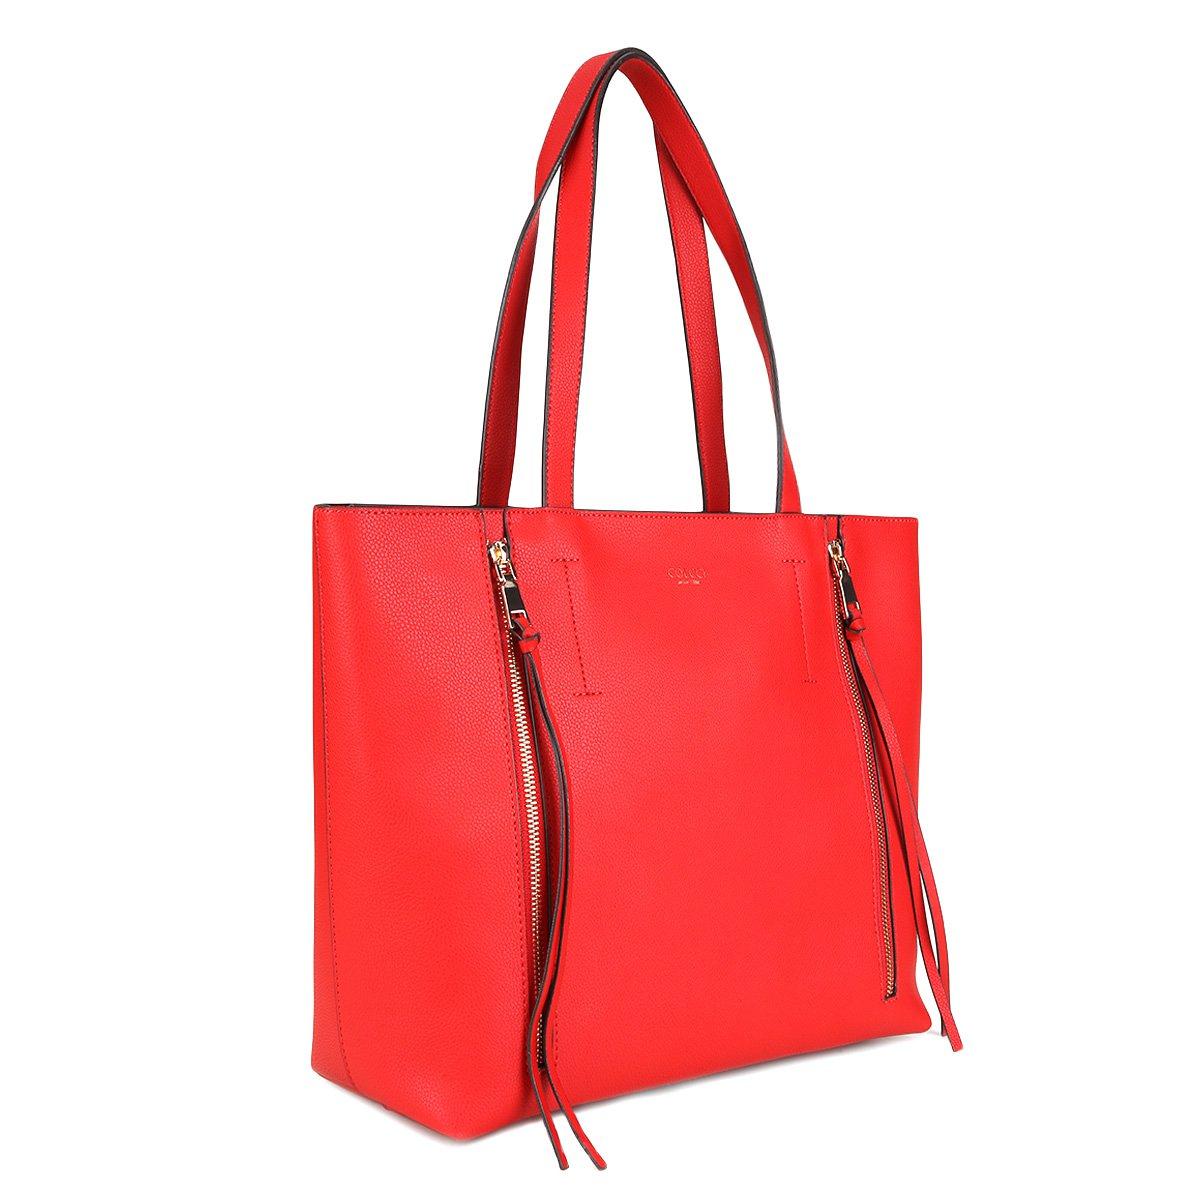 d19b8052b Bolsa Colcci Shopper Zíper Frontal Feminina - Compre Agora   Zattini